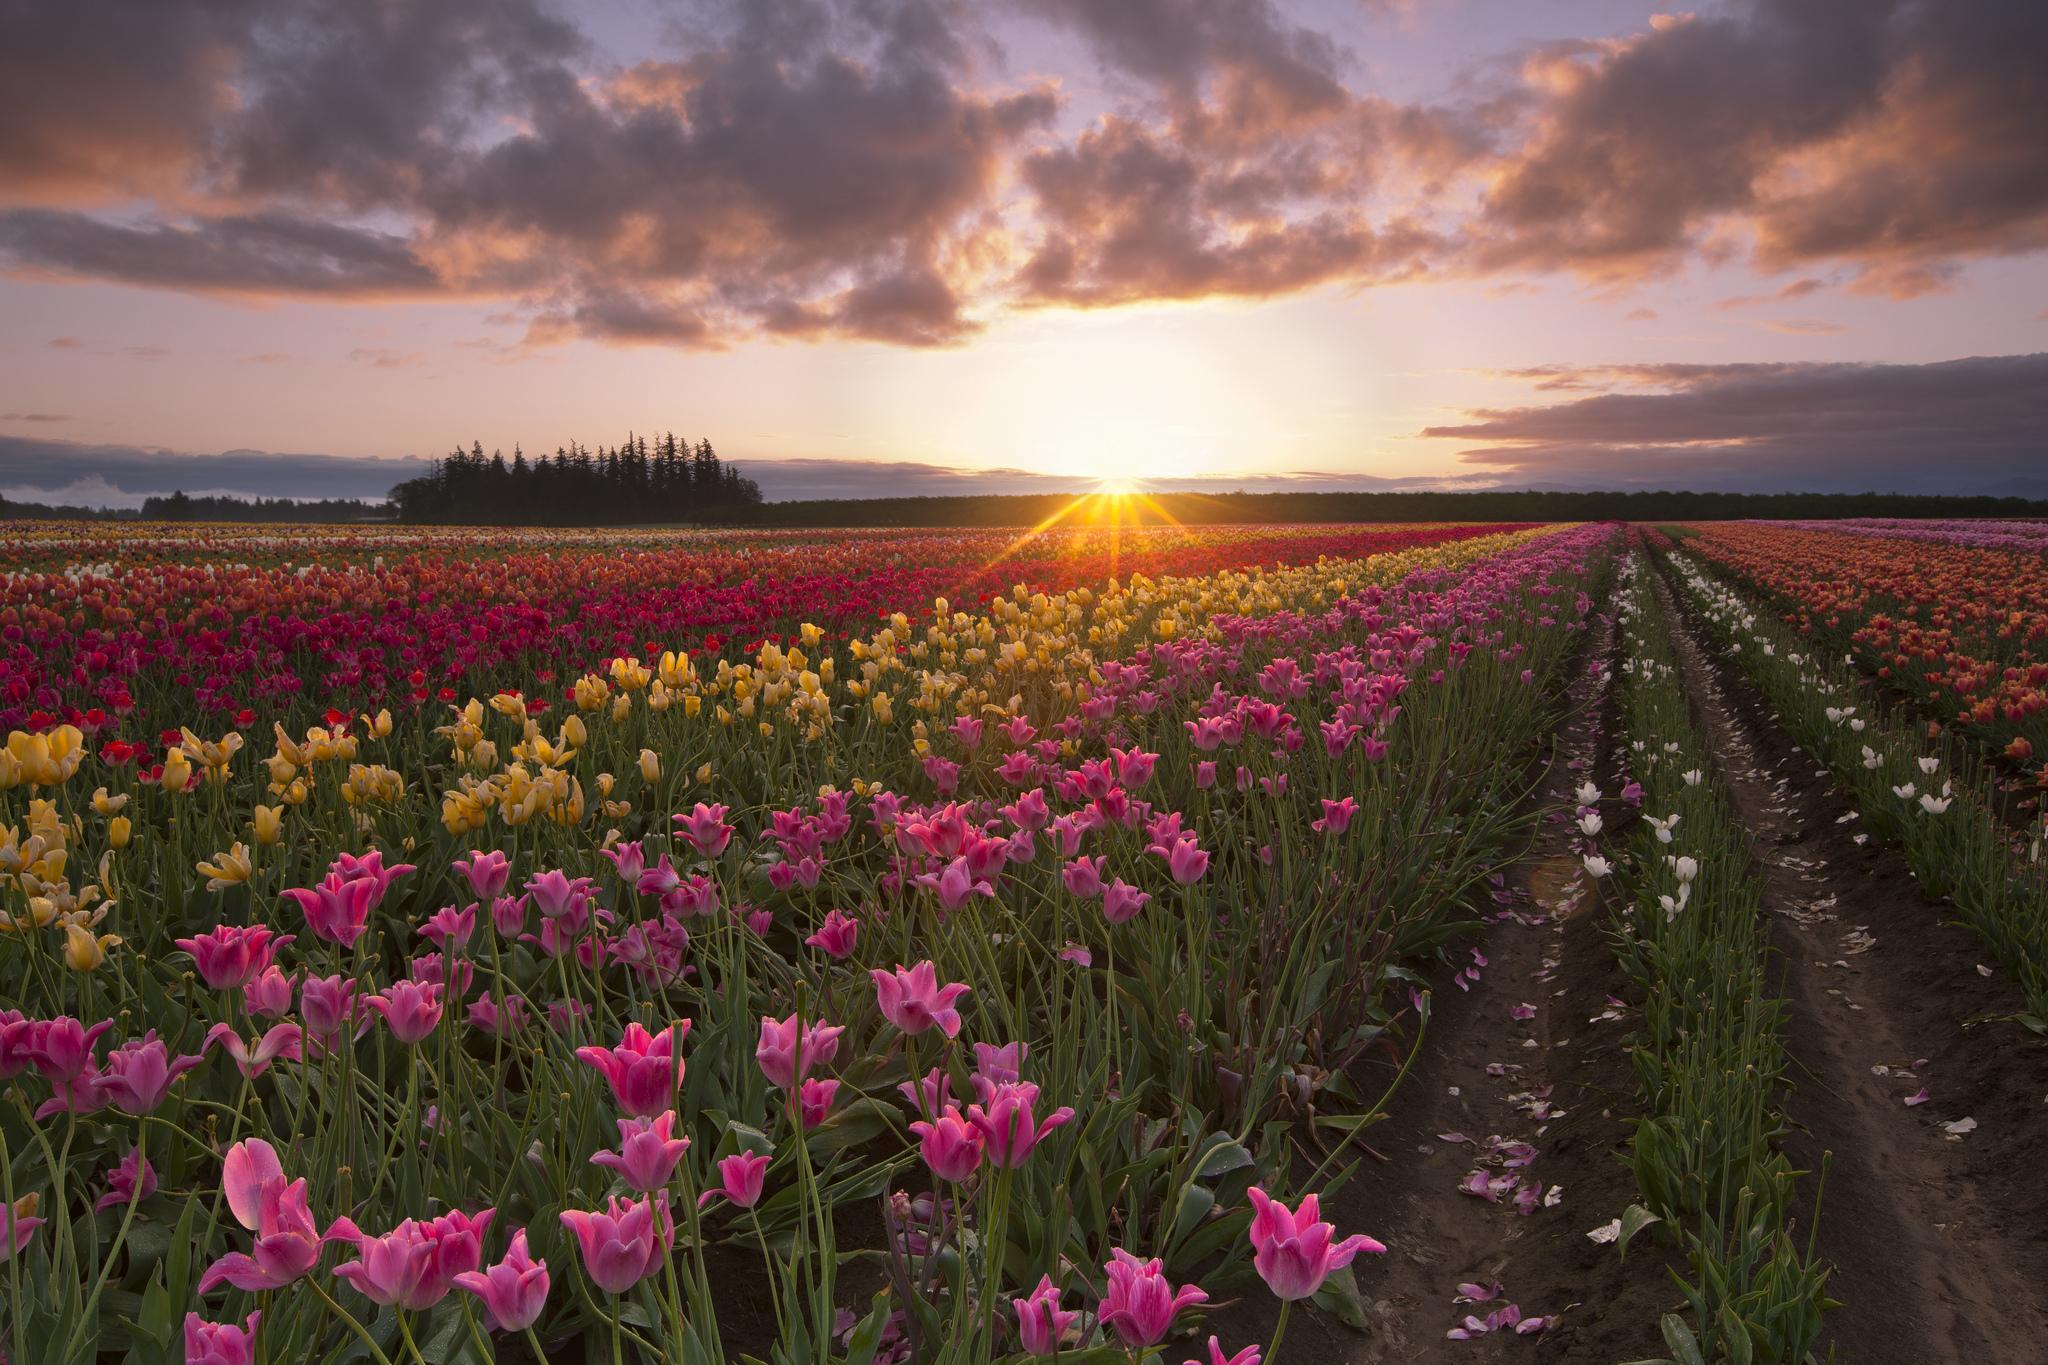 поле цветы рассвет field flowers dawn  № 3837007 без смс